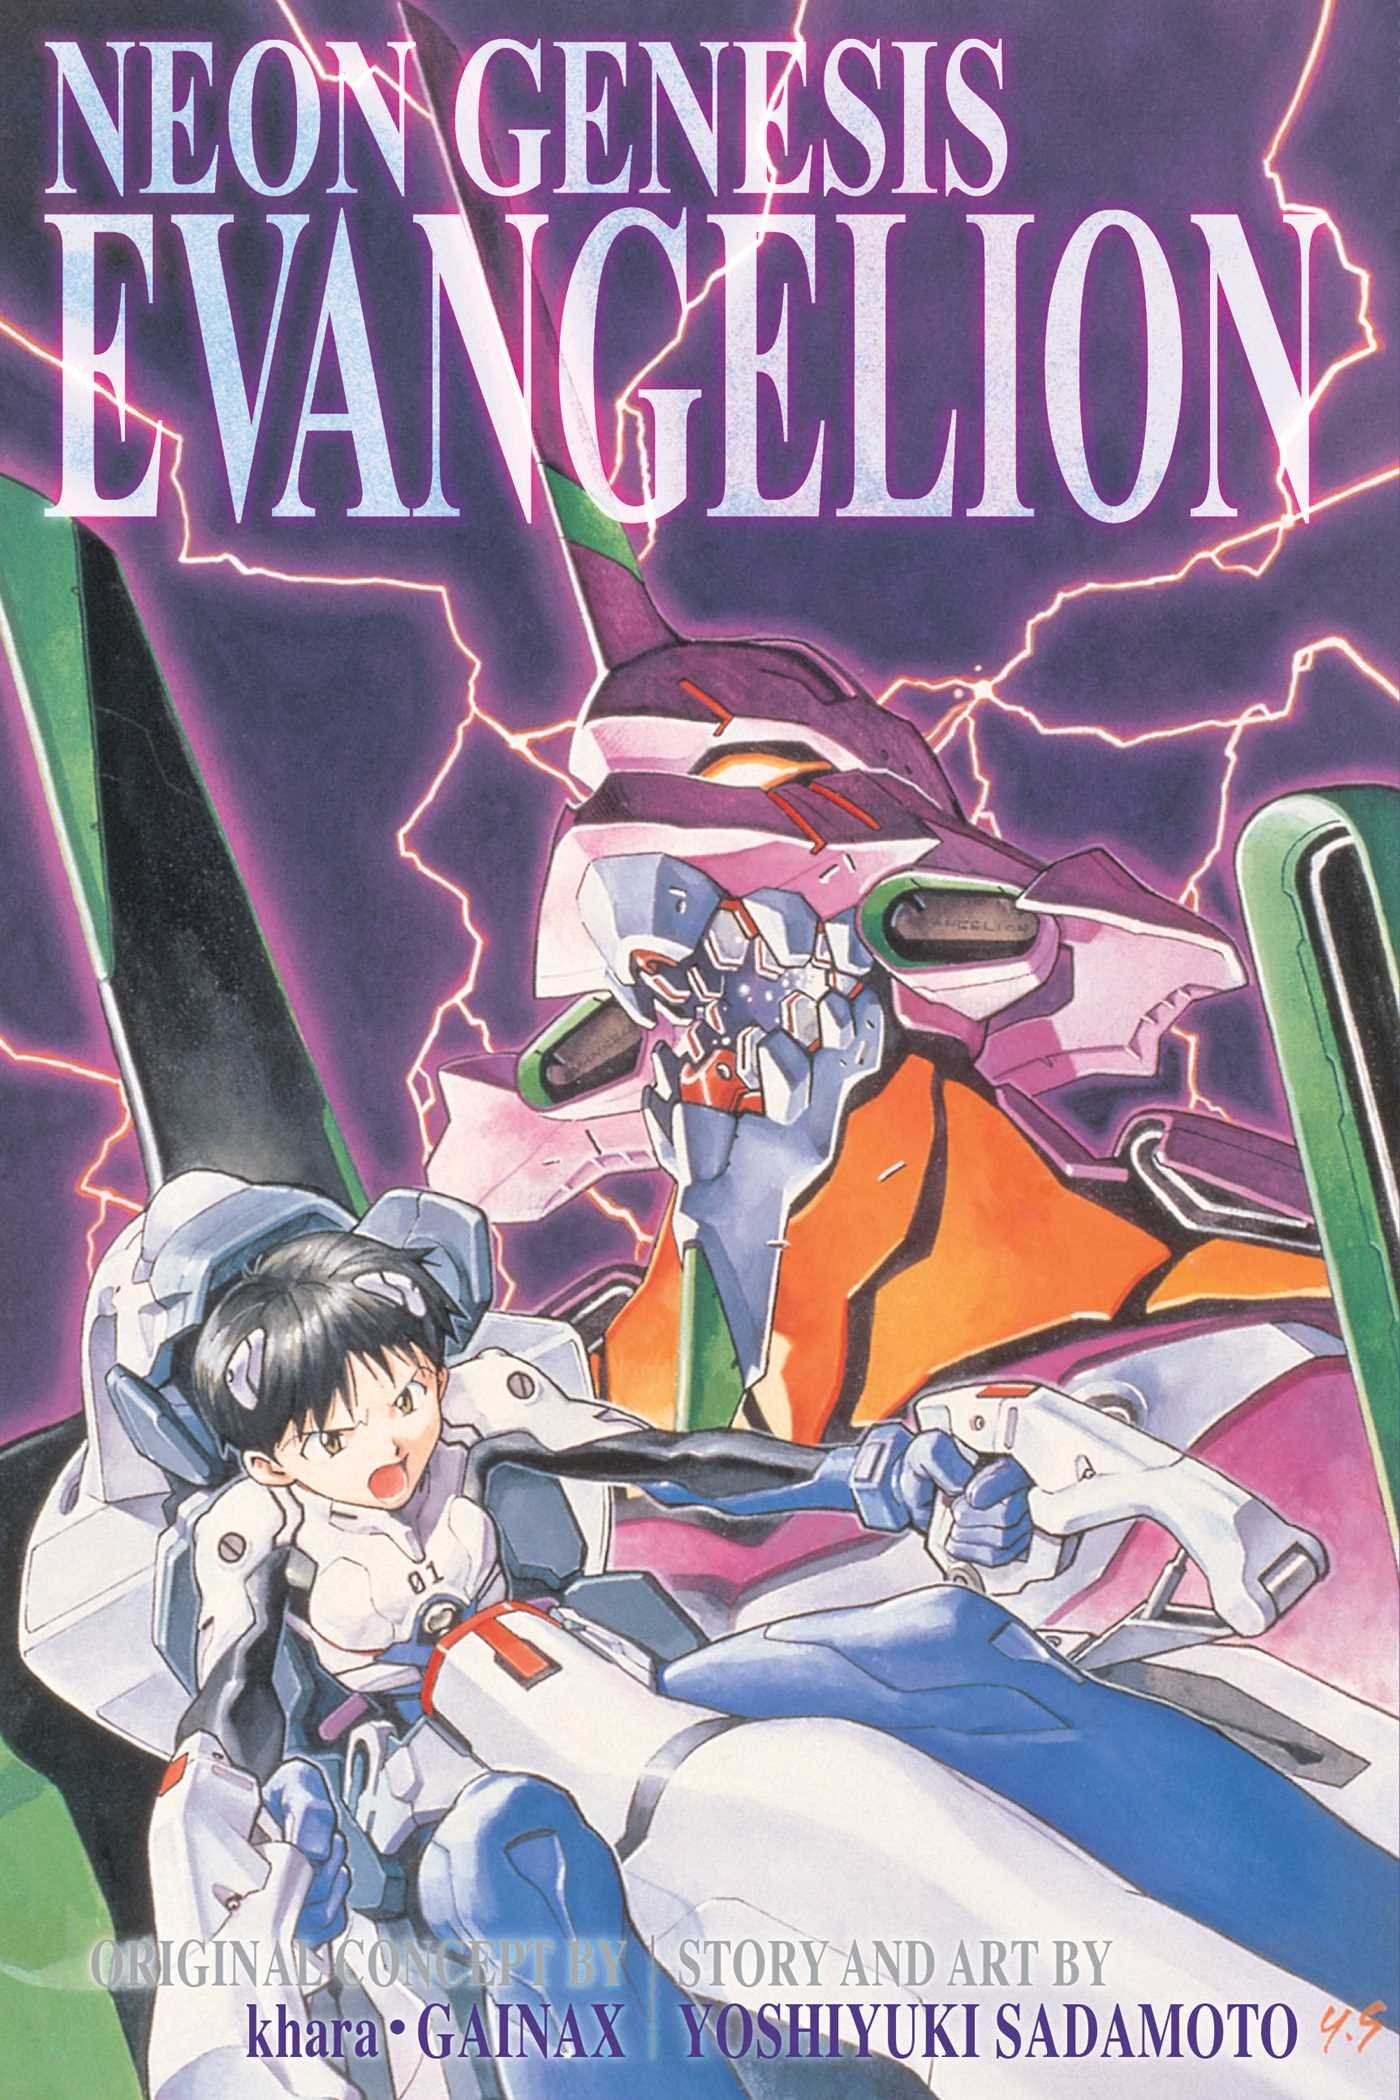 Neon Genesis Evangelion Vol 1 Yoshiyuki Sadamoto 9781421550794 Amazon Books